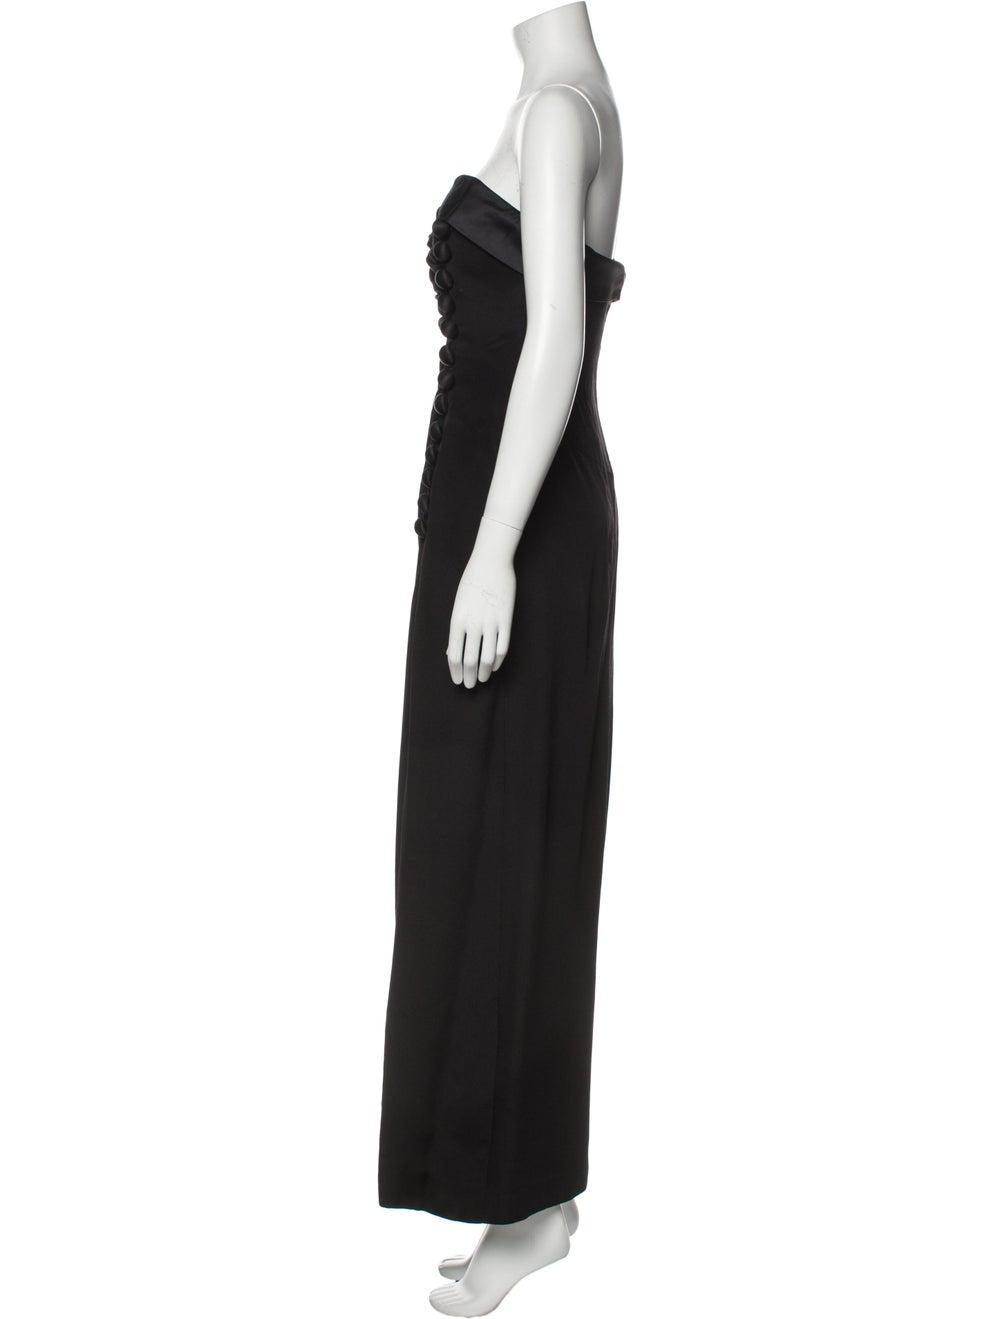 Arnold Scaasi Vintage Long Dress Black - image 2